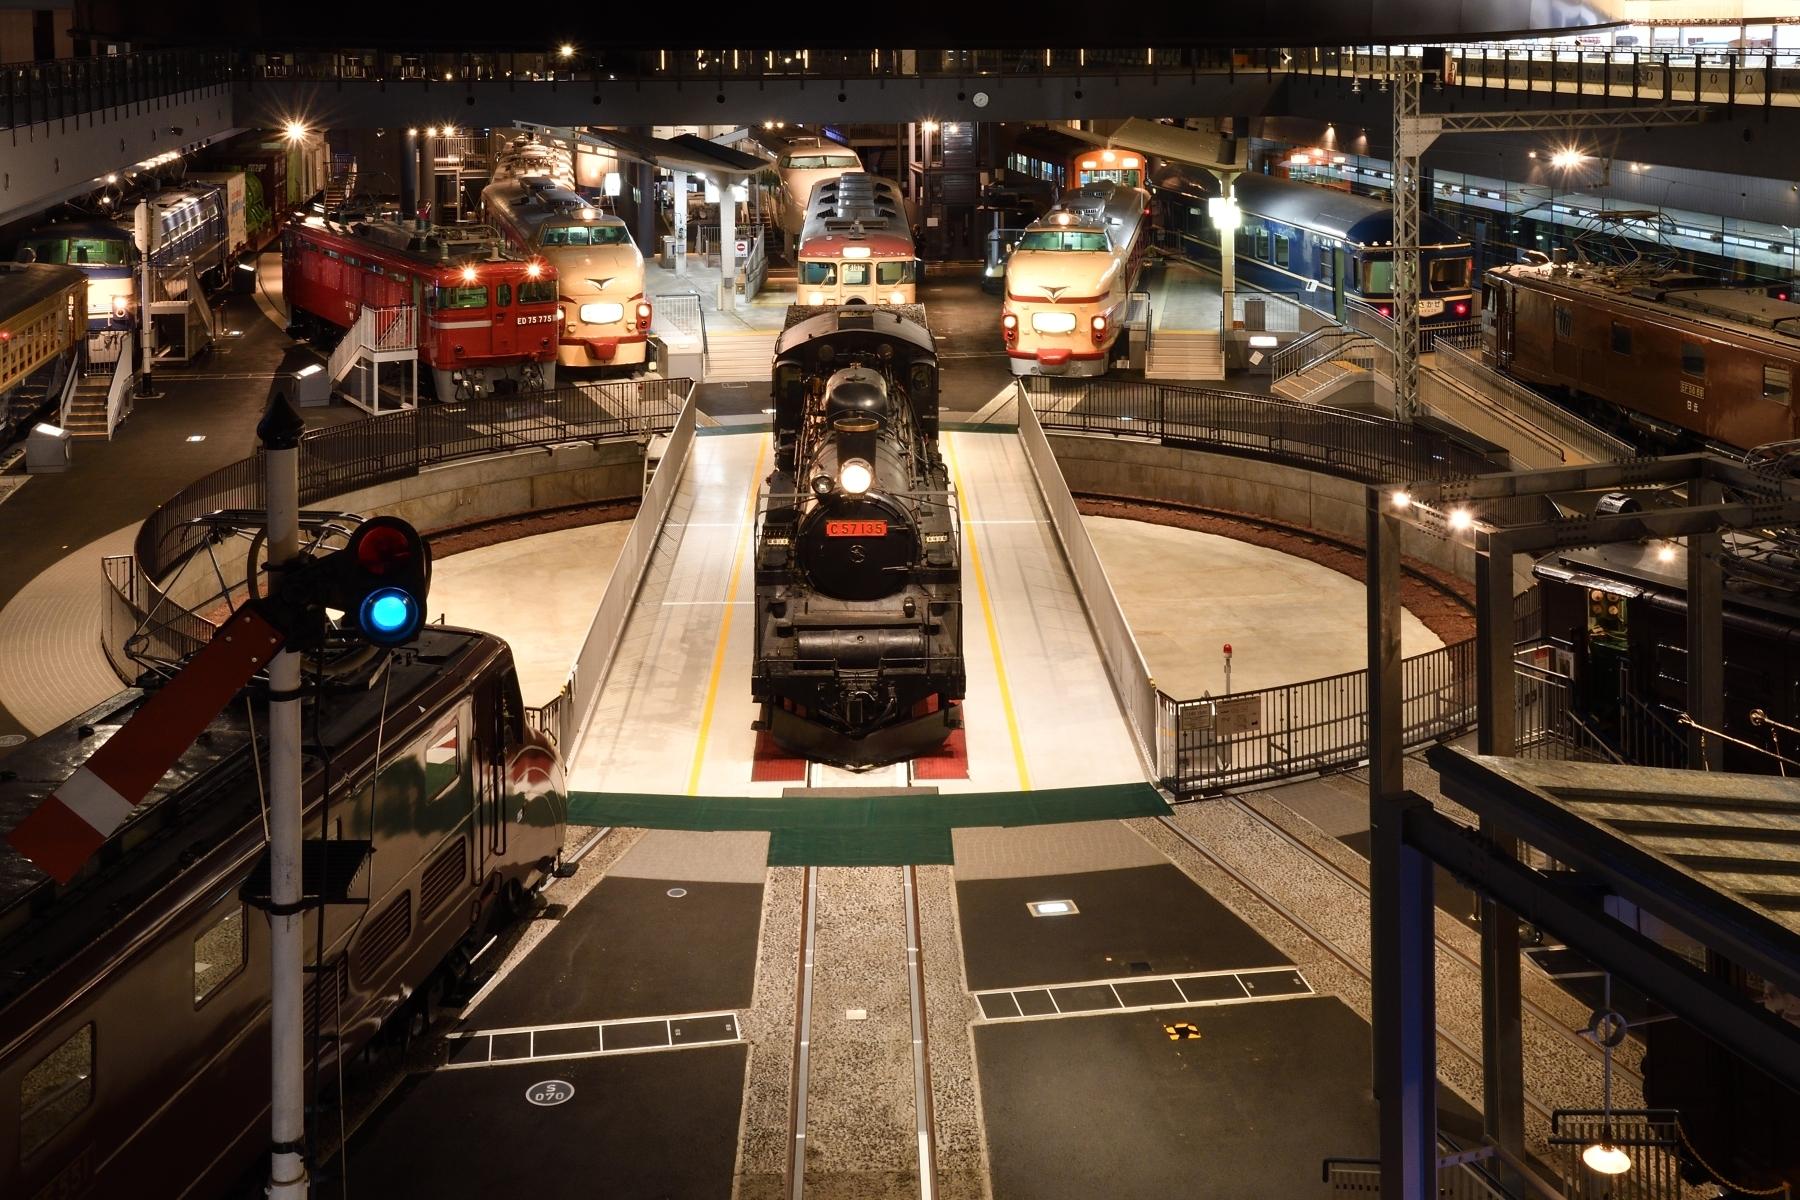 The Railway Museum